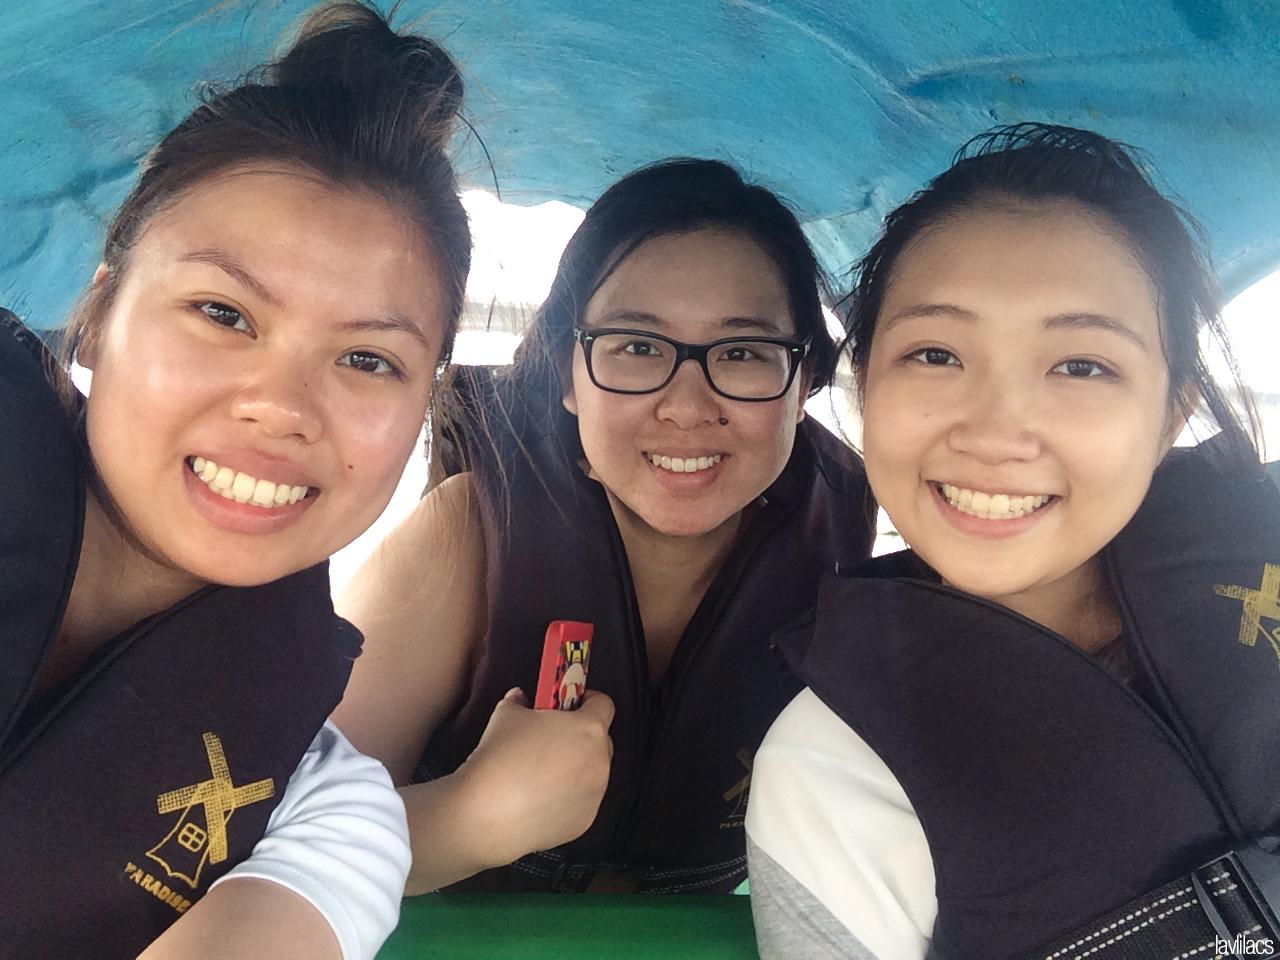 Seoul, Korea - Summer Study Abroad 2014 - Yeouido Park - Han River - swan pedal boat selfie